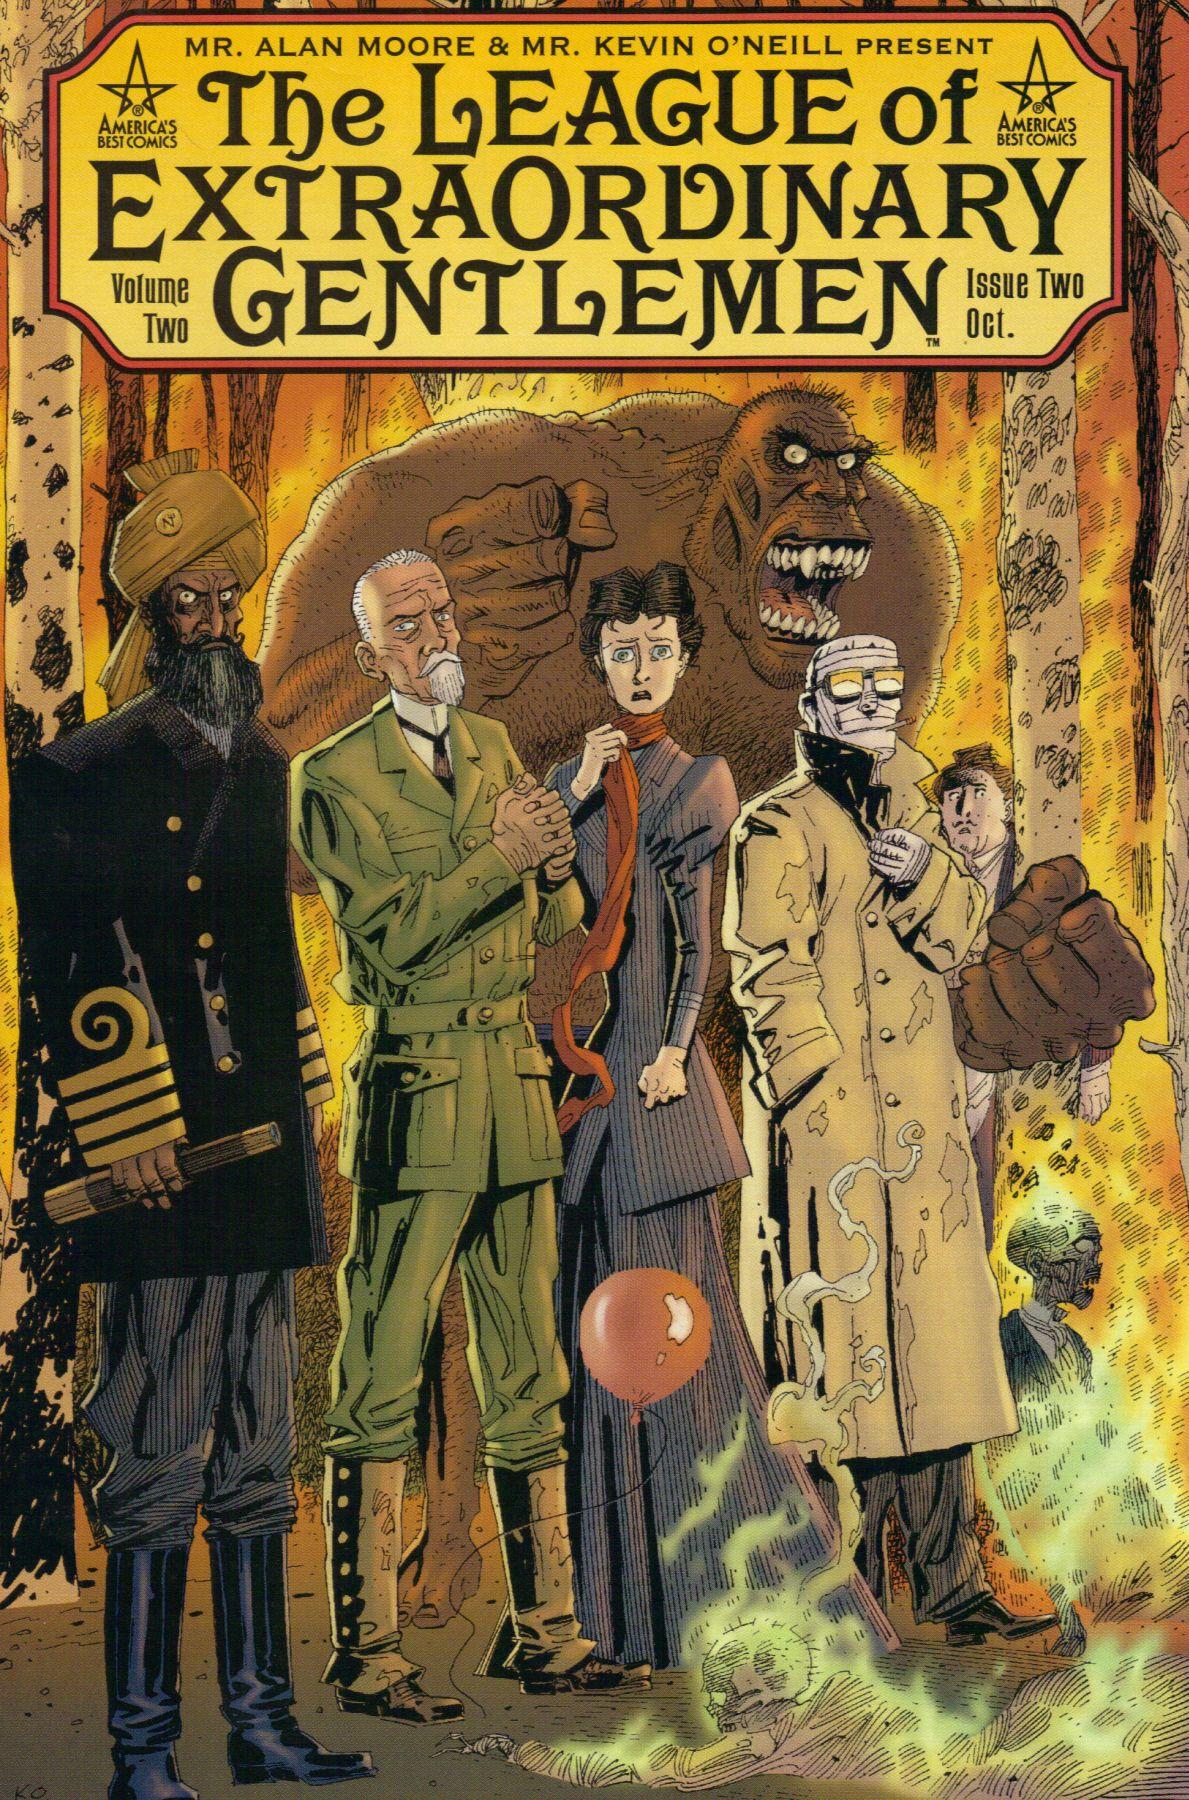 The league of extraordinary gentlemen book cover